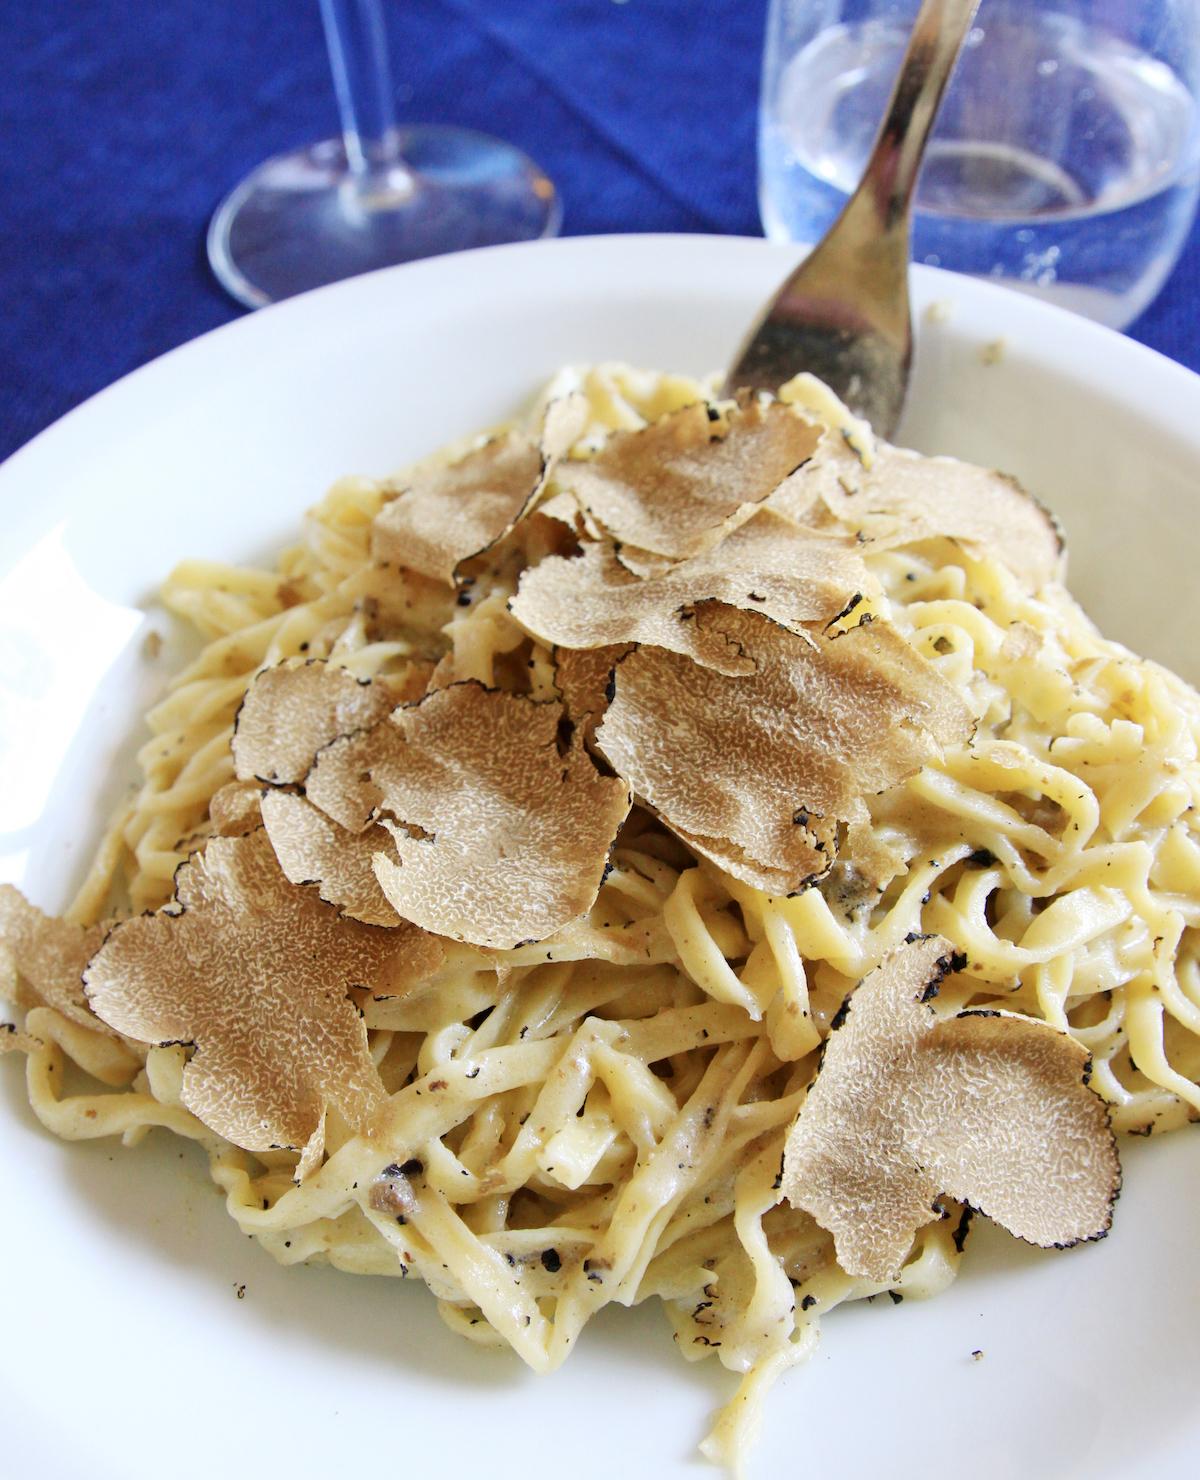 Pâtes et truffes blanches ©Morenovel shutterstock